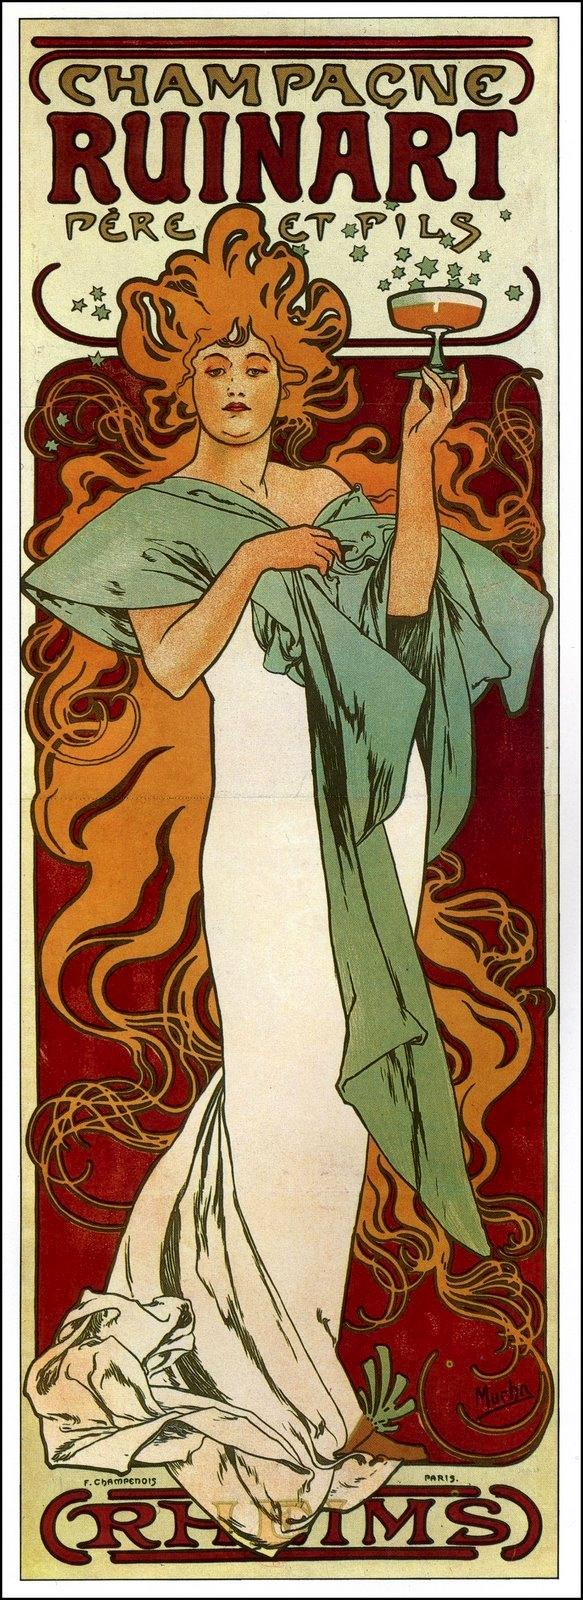 Реклама сухого шампанского Ruinart-1896